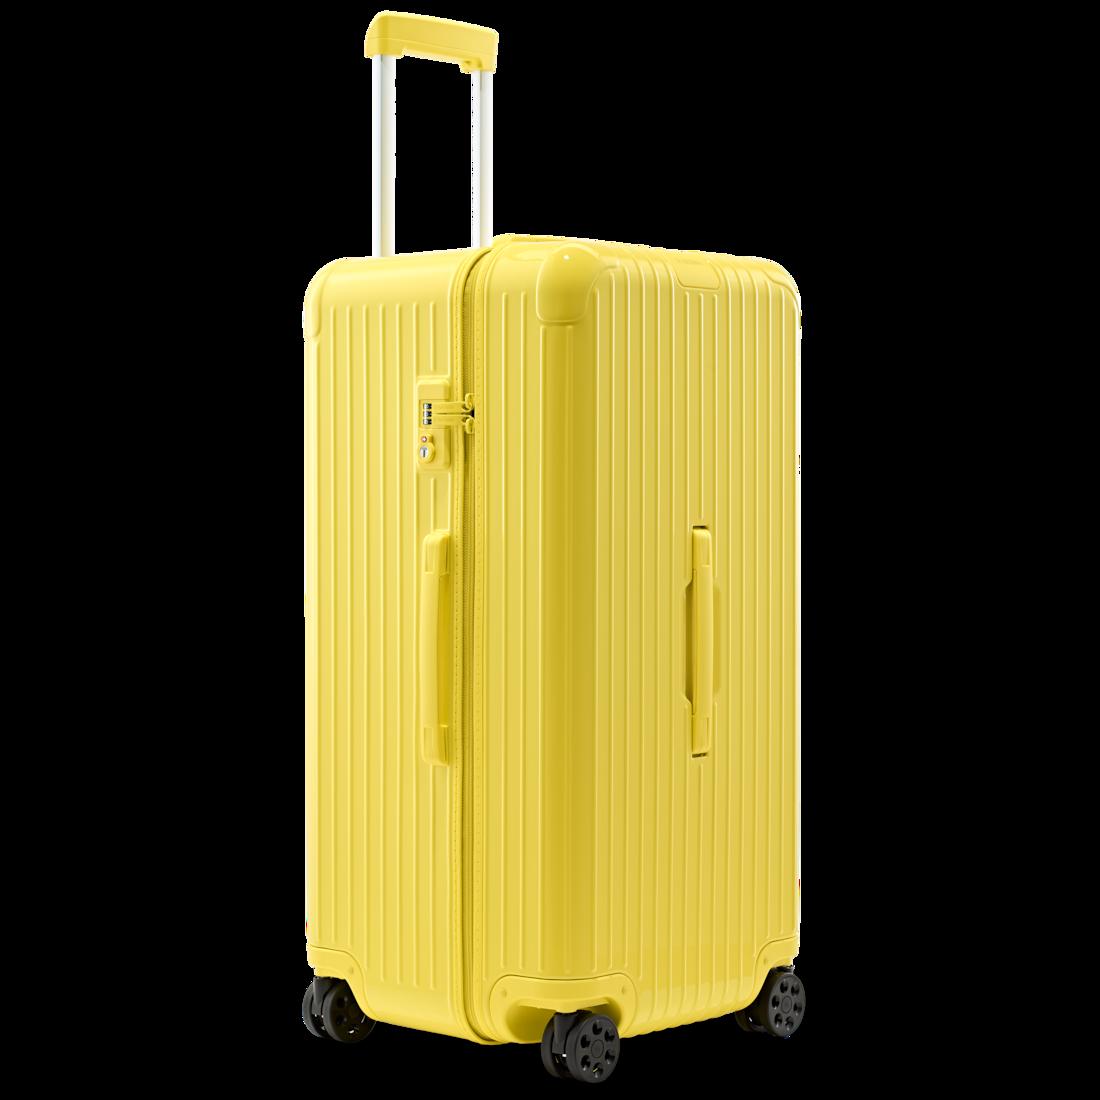 Original Trunk Plus Aluminum Suitcase Saffron Yellow Rimowa Rimowa Hard Shell Luggage Lightweight Suitcase